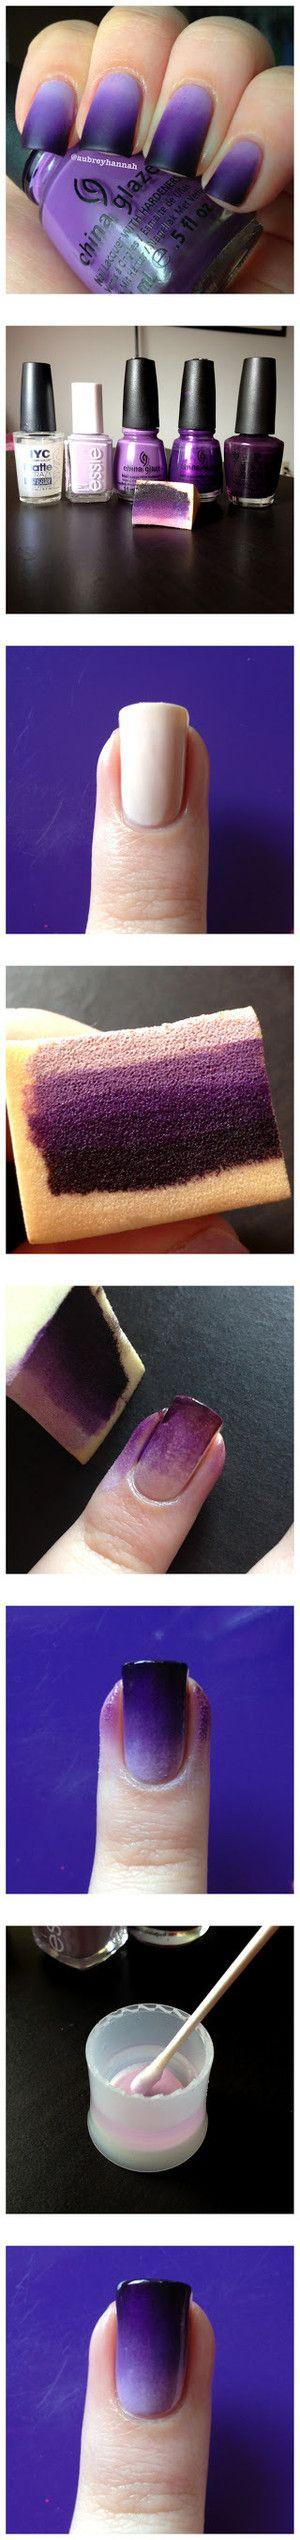 Purple Gradiant. 986f96d1b7c31a7e983dde25263bbf89